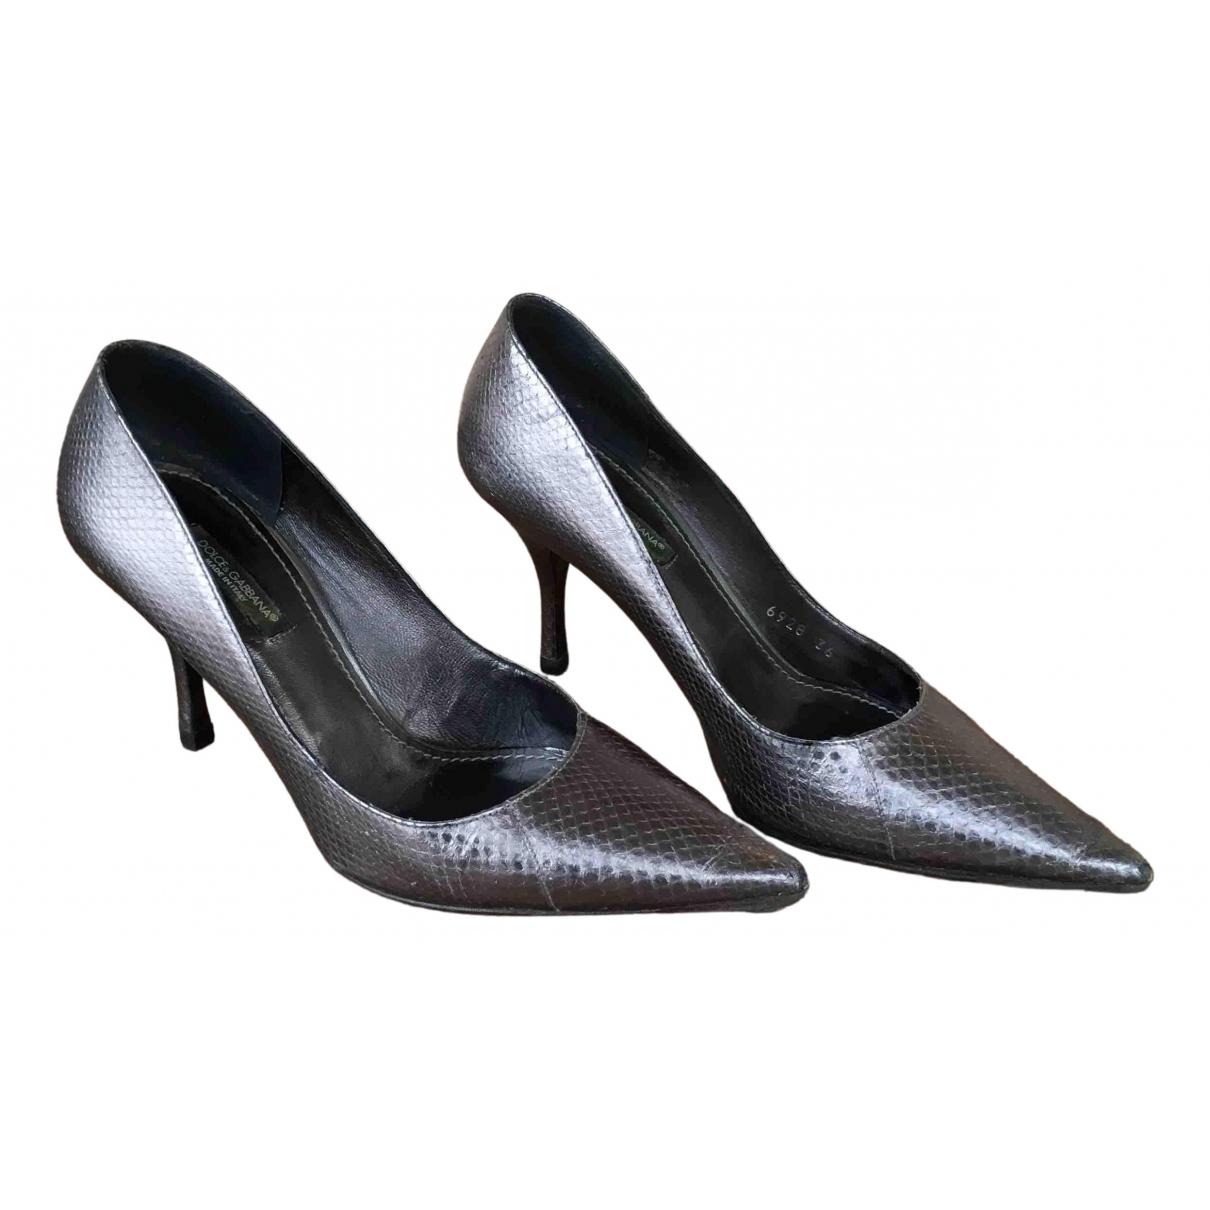 Dolce & Gabbana N Silver Python Heels for Women 36 EU